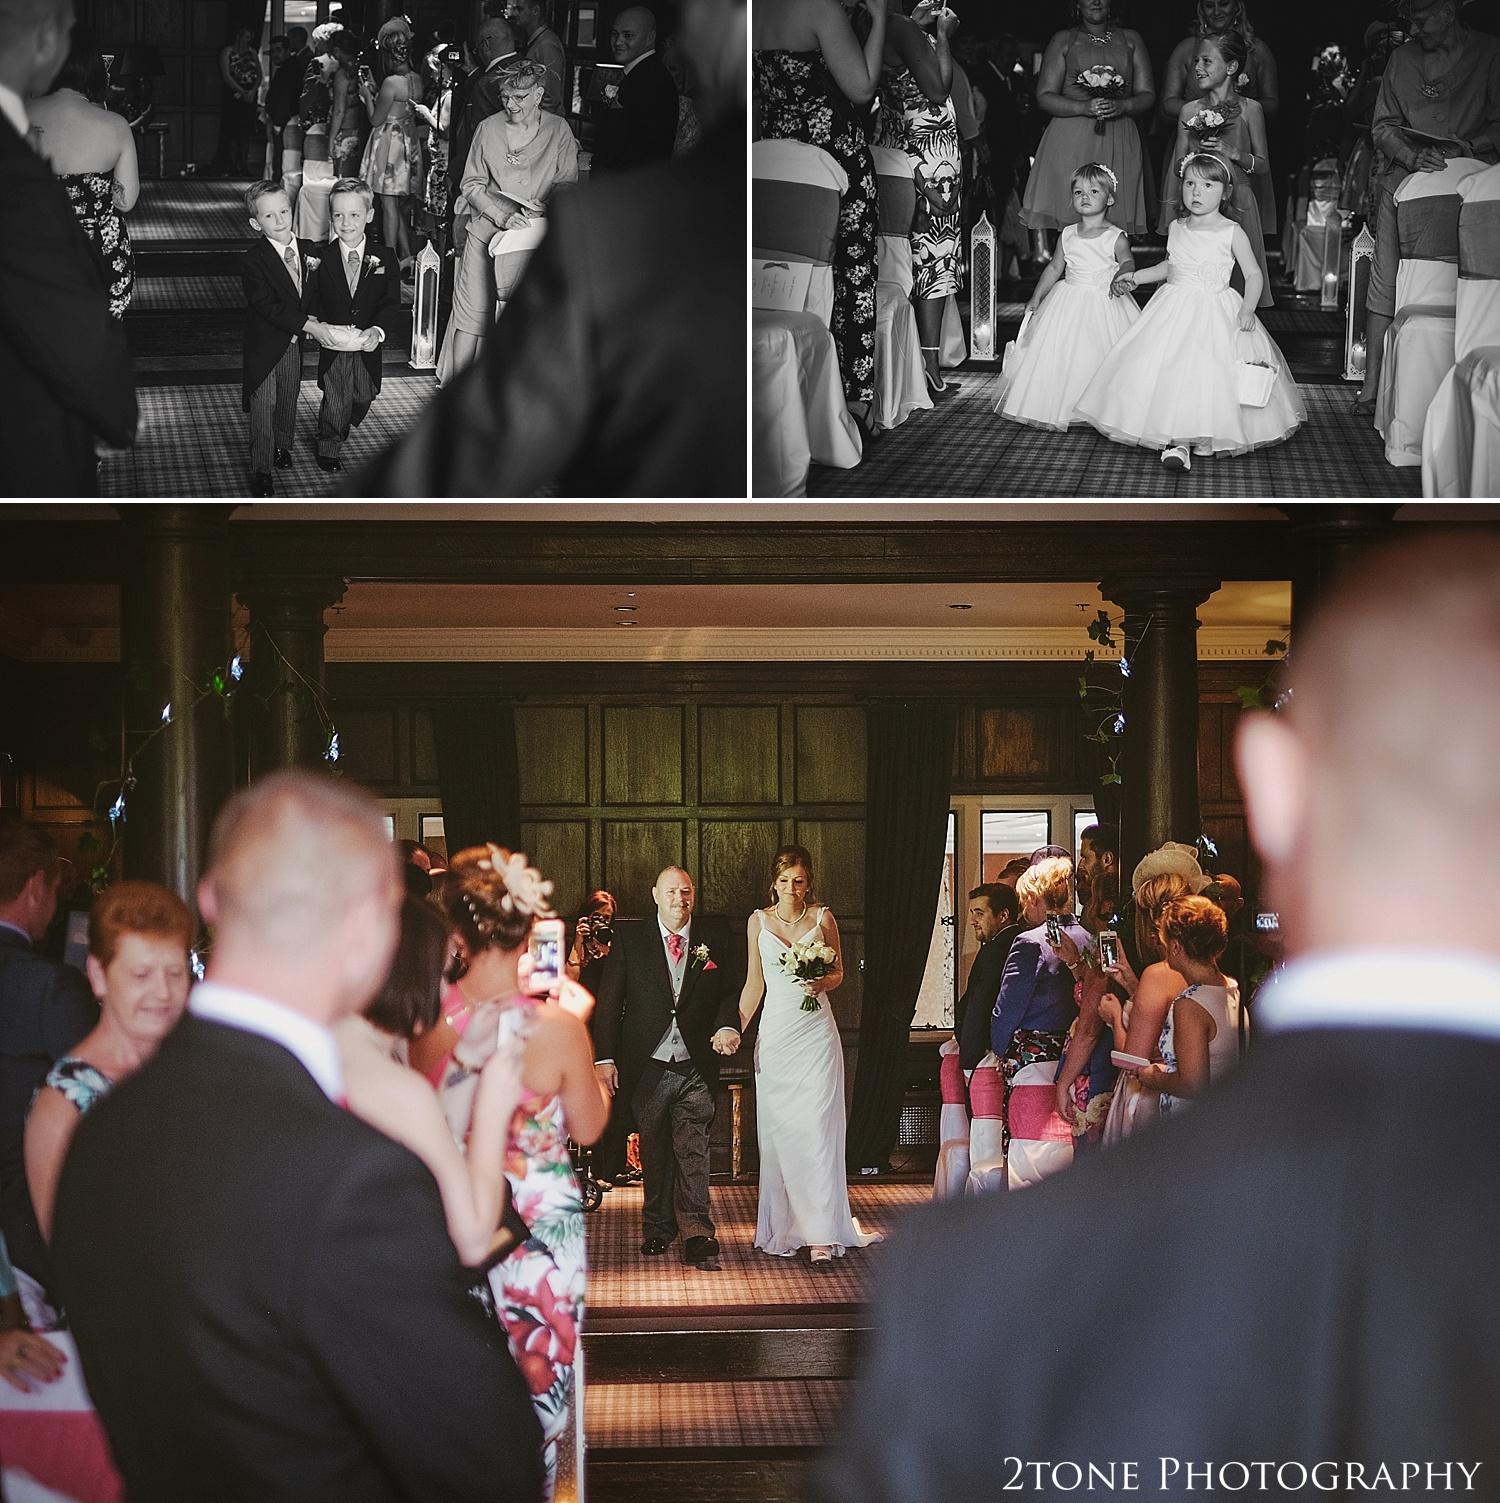 The wedding ceremony.  Slaley Hall wedding photography by wedding photographers 2tone Photography.  www.2tonephotography.co.uk